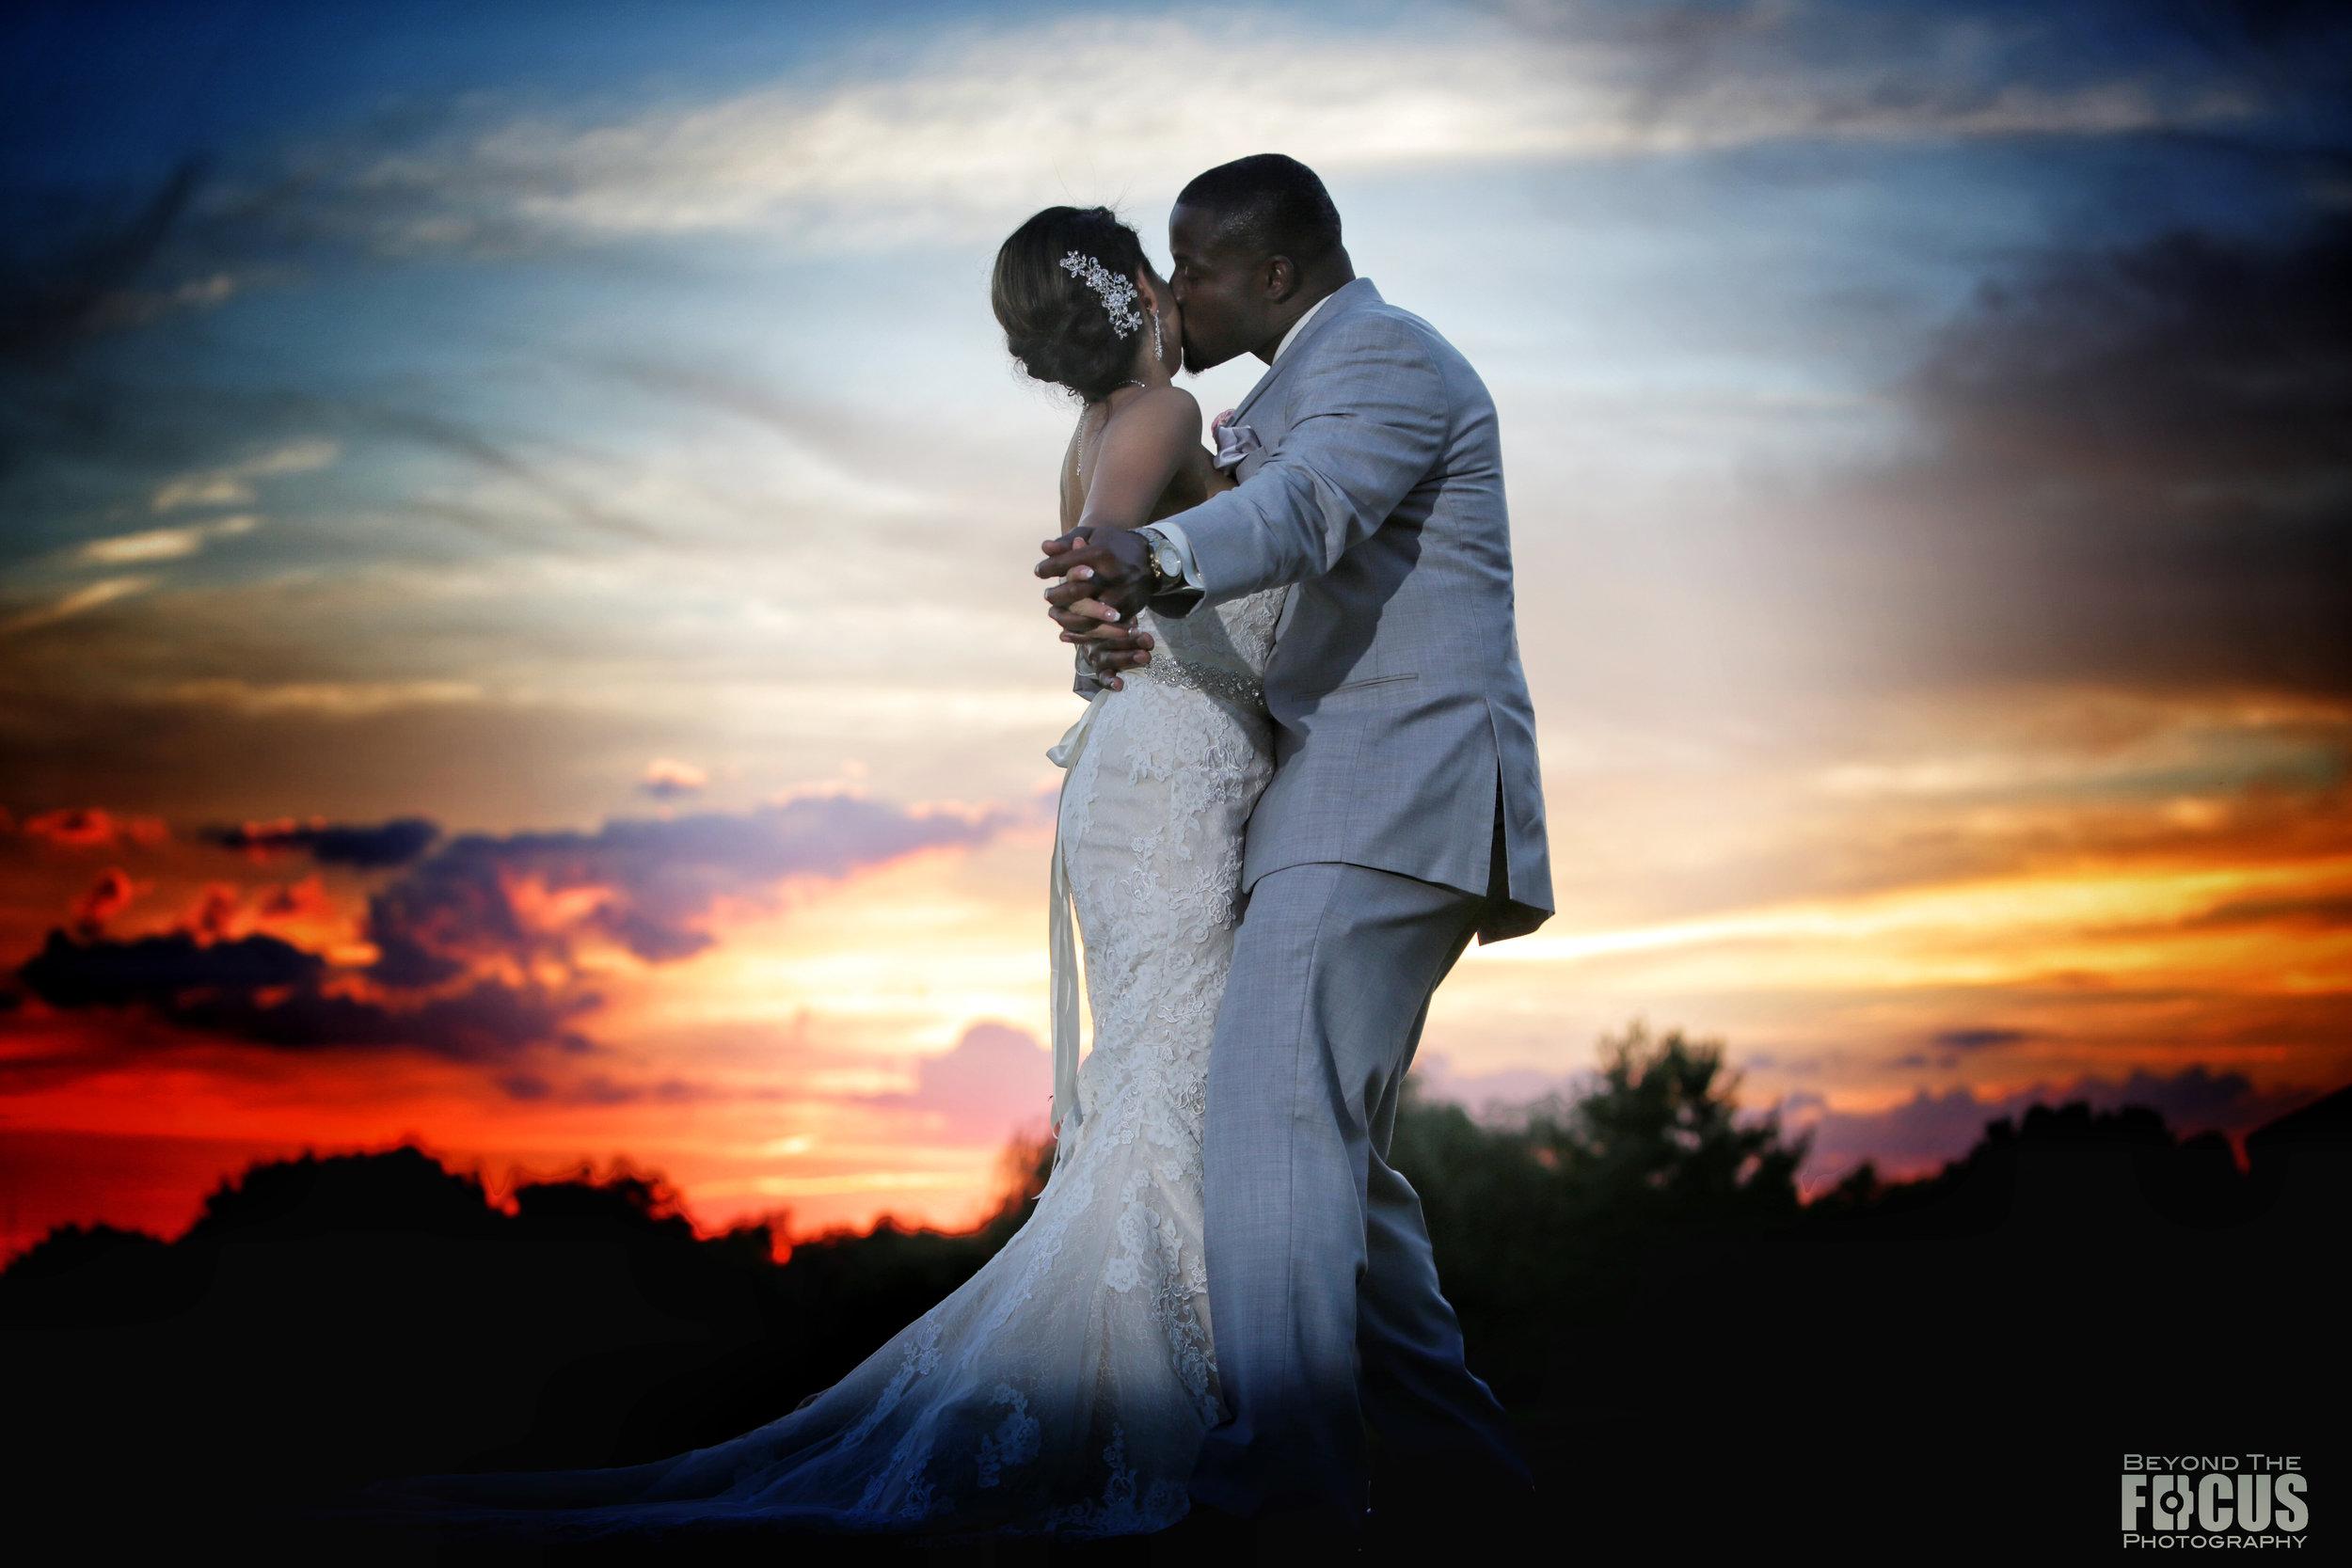 Palmer Wedding - Bride& Groom Post Wedding 6.jpg